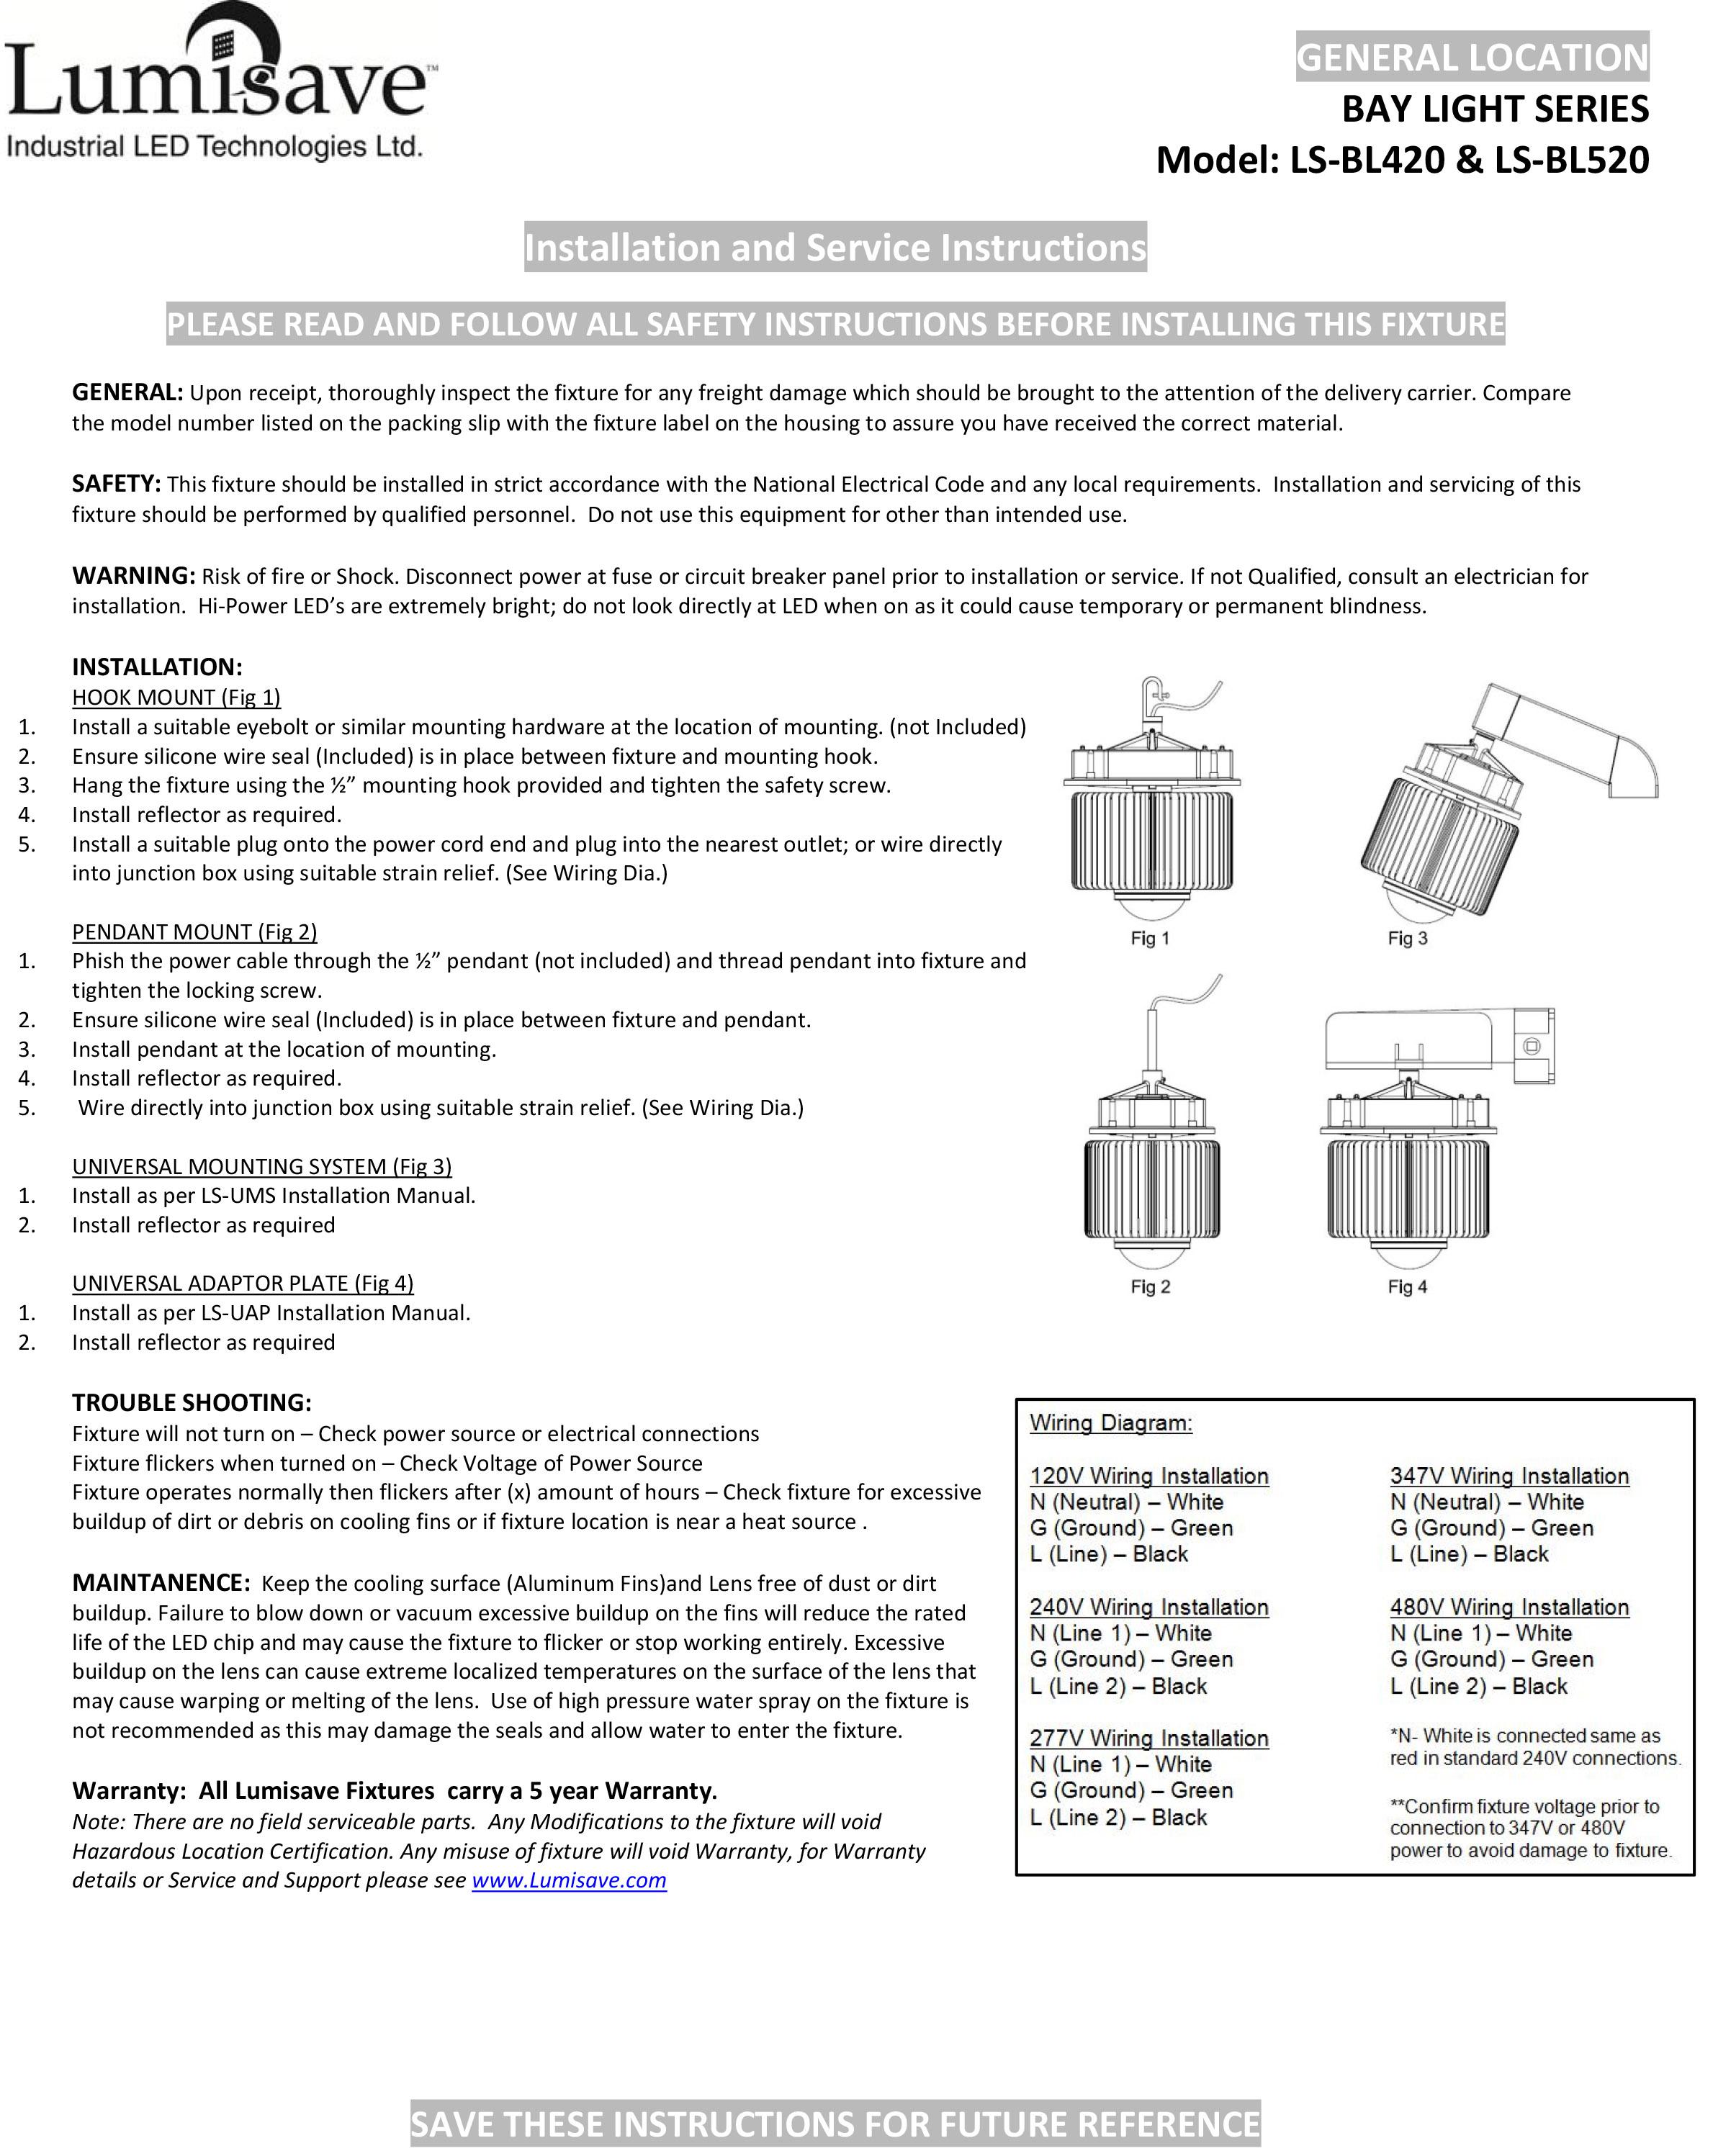 yammer post image Array - microsoft word bl manual 2015 lumisave industrial  led technologies rh lumisave com